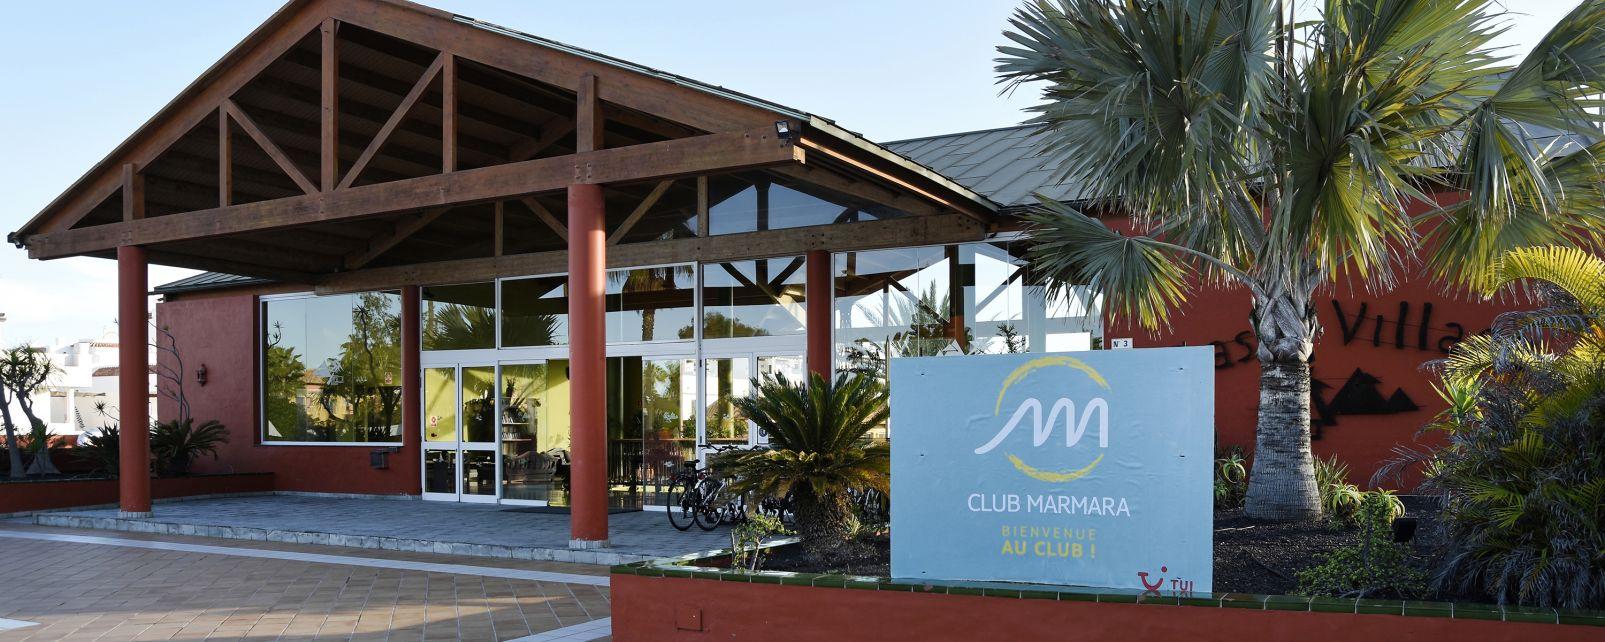 Club Marmara Oasis Village